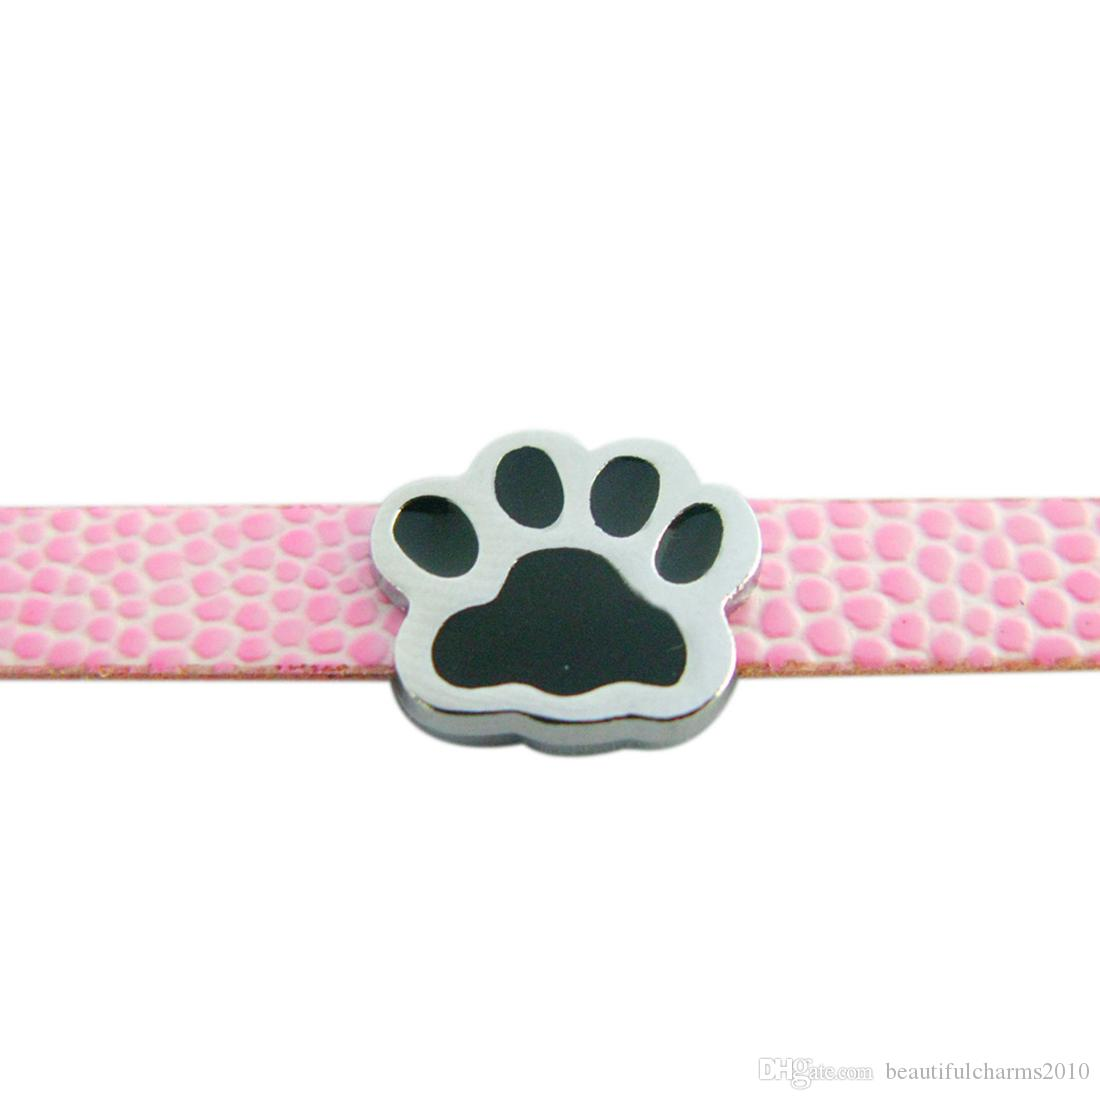 Großhandel 50 teile / los 8mm schwarze pfote diacharme fit für 8mm DIY Zubehör hundehalsband armband armband